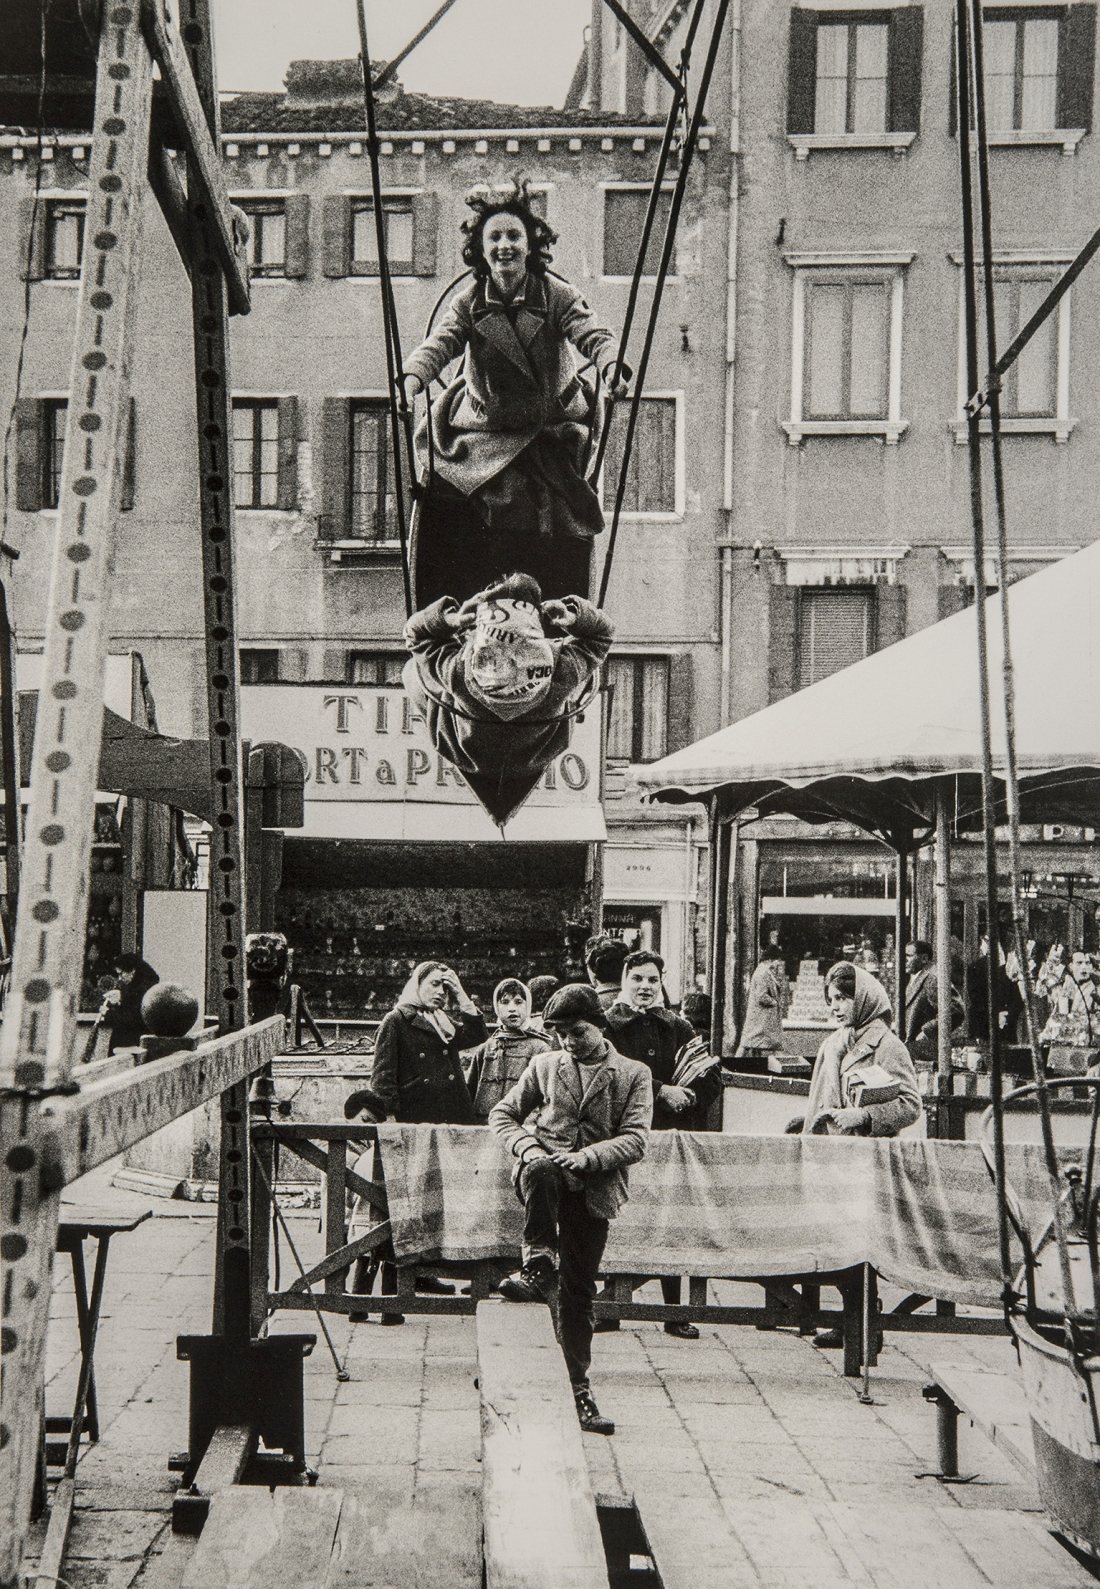 Venice 1958 - Gianni Berengo Gardin